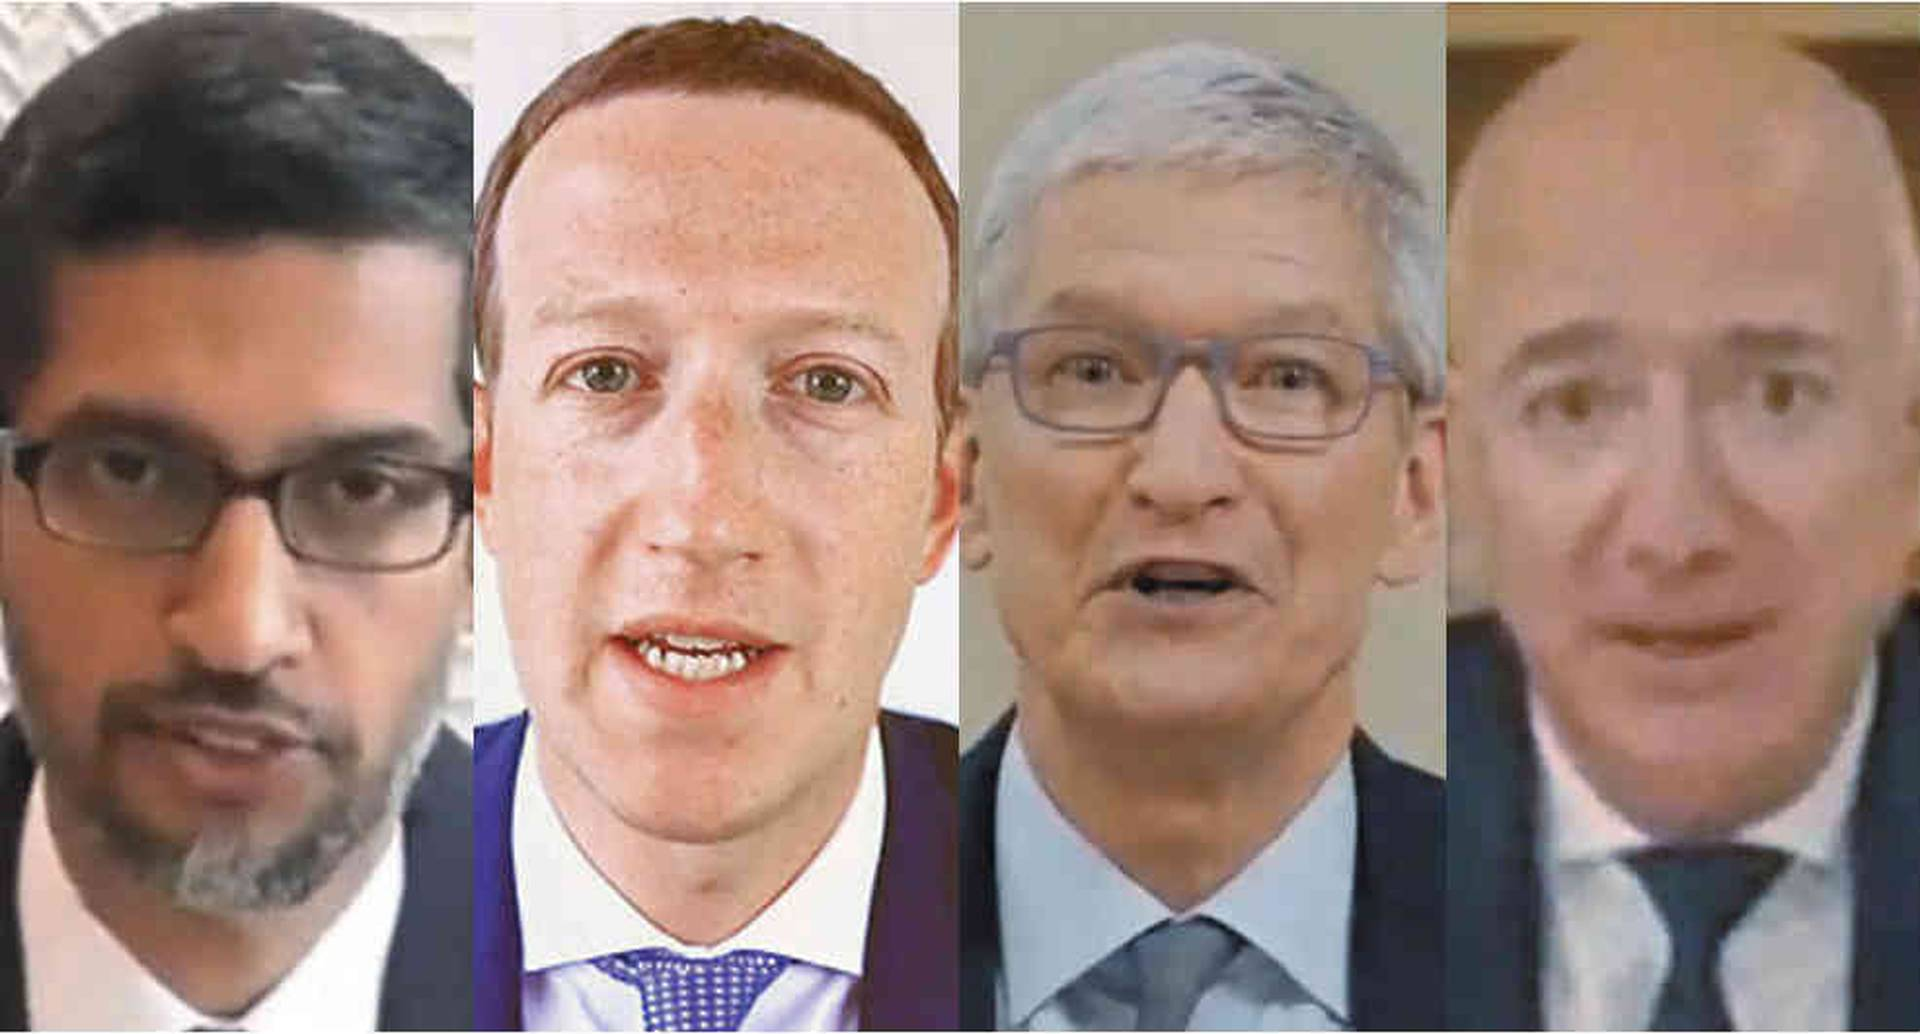 De izquierda a derecha: Sundar Pichai (Google), Mark Zuckerberg (Facebook), Tim Cook (Apple) y Jeff Bezos (Amazon)